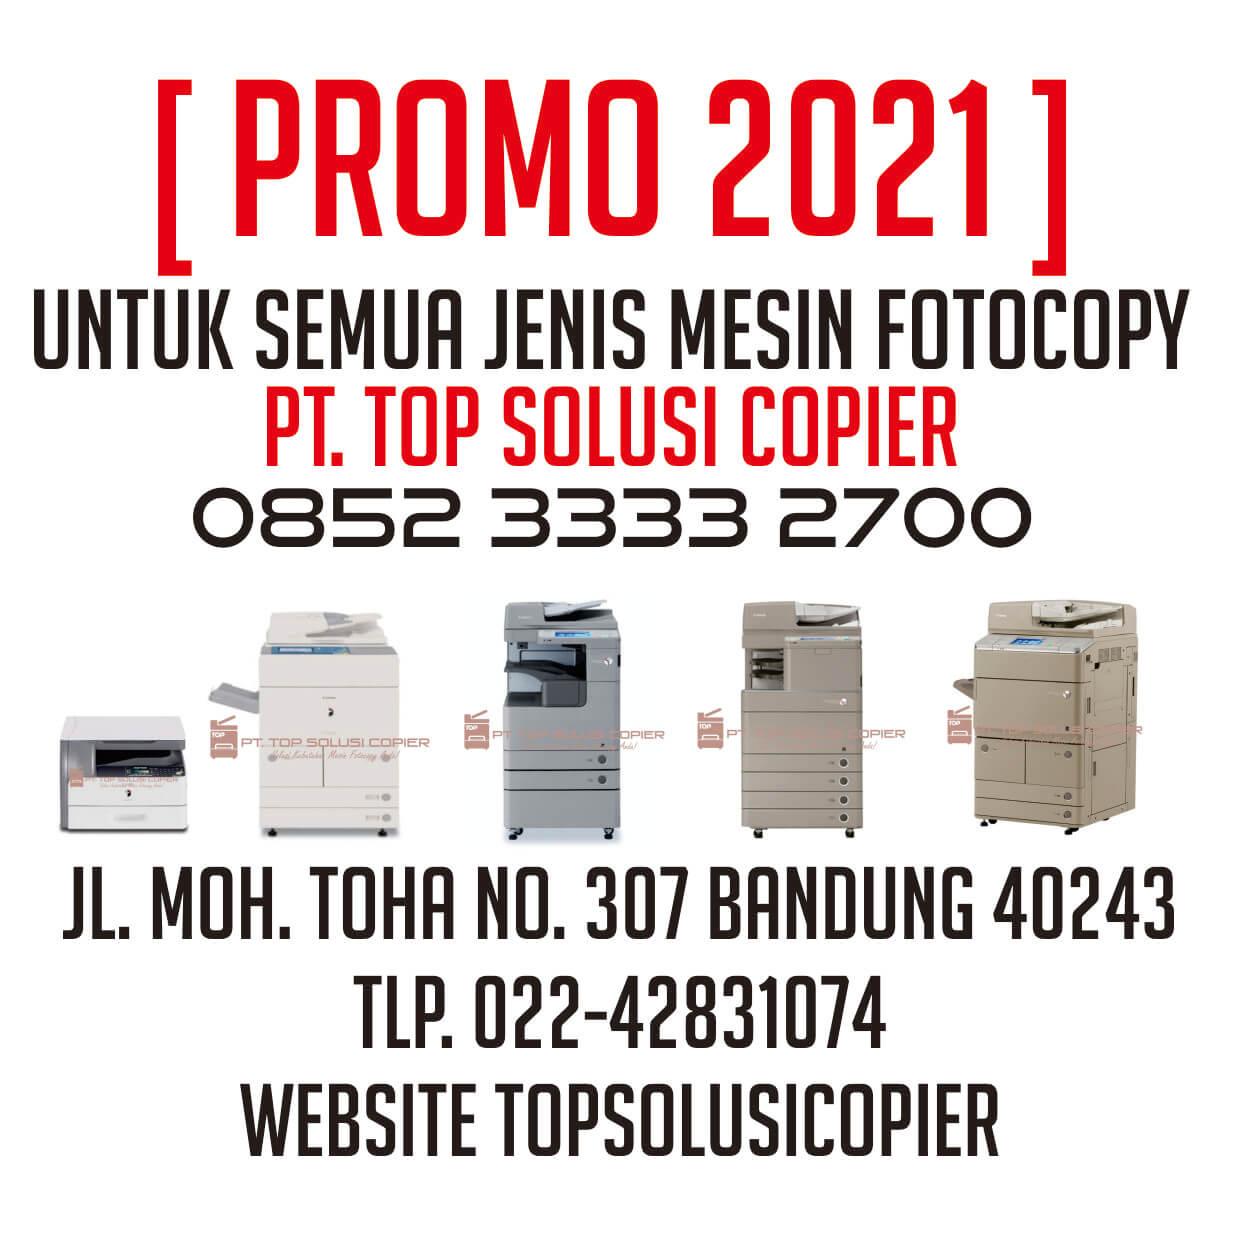 mesin fotocopy garut 2021